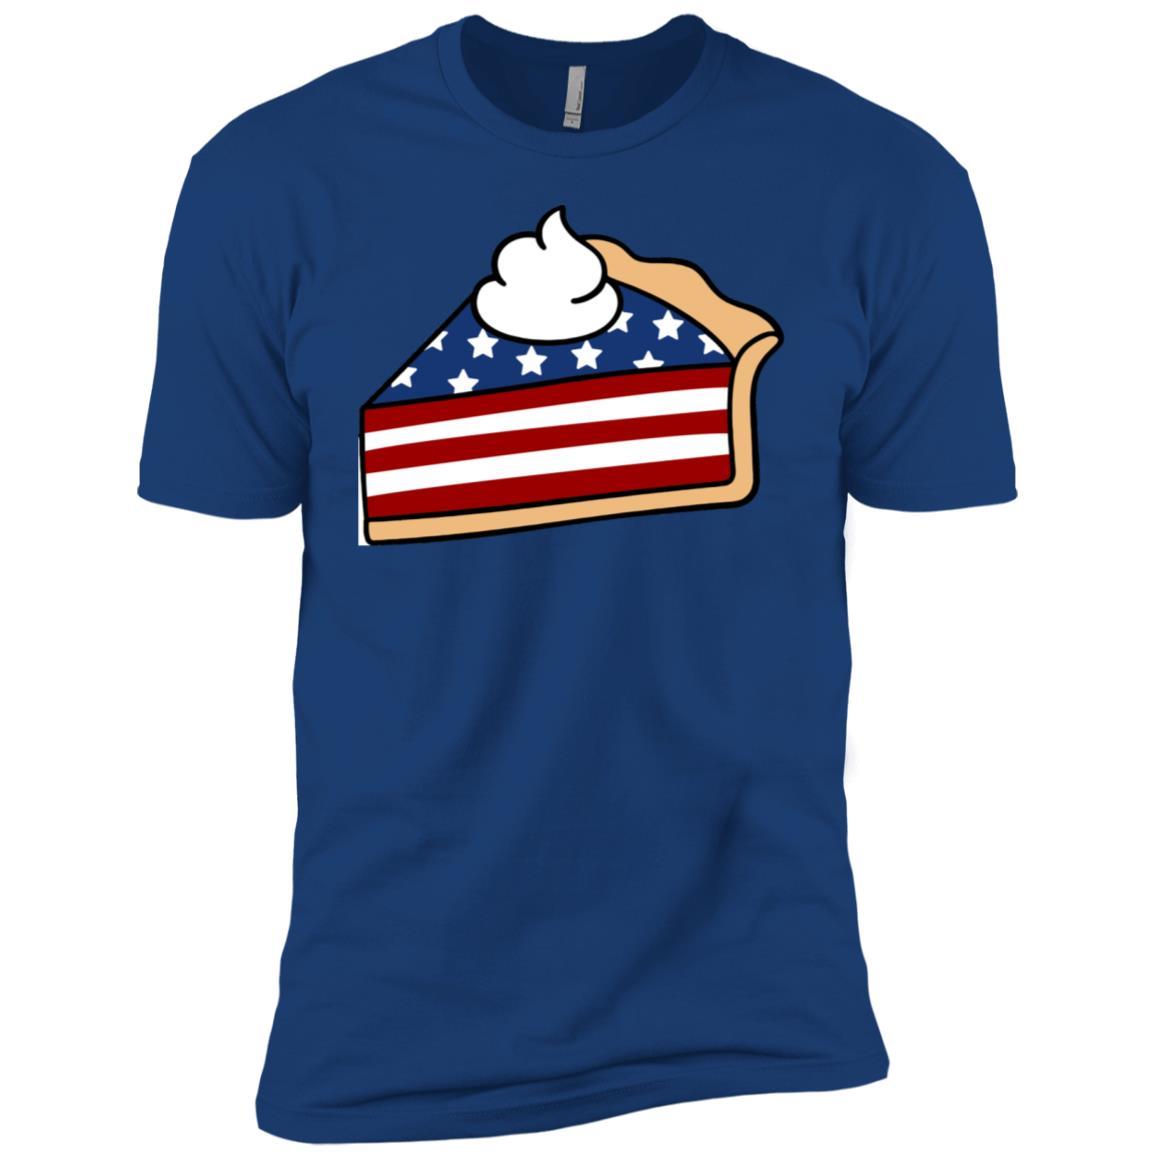 Pumpkin Pie Usa Flag Patriotic Pride 4th Of July Cute Men Short Sleeve T-Shirt